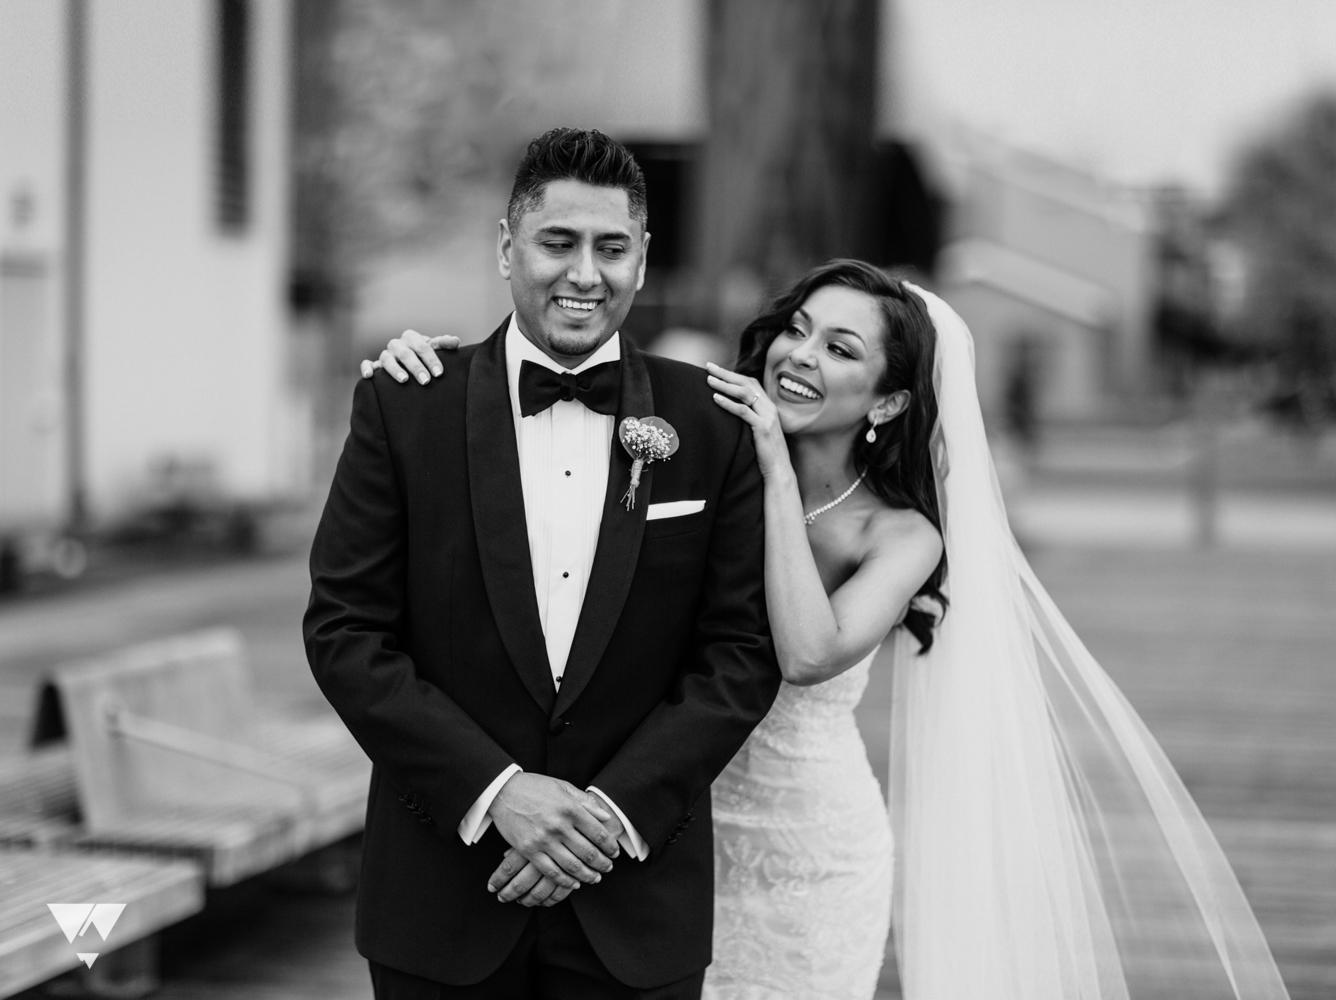 herafilms_wedding_trina_andy_hera_selects_web-22.jpg